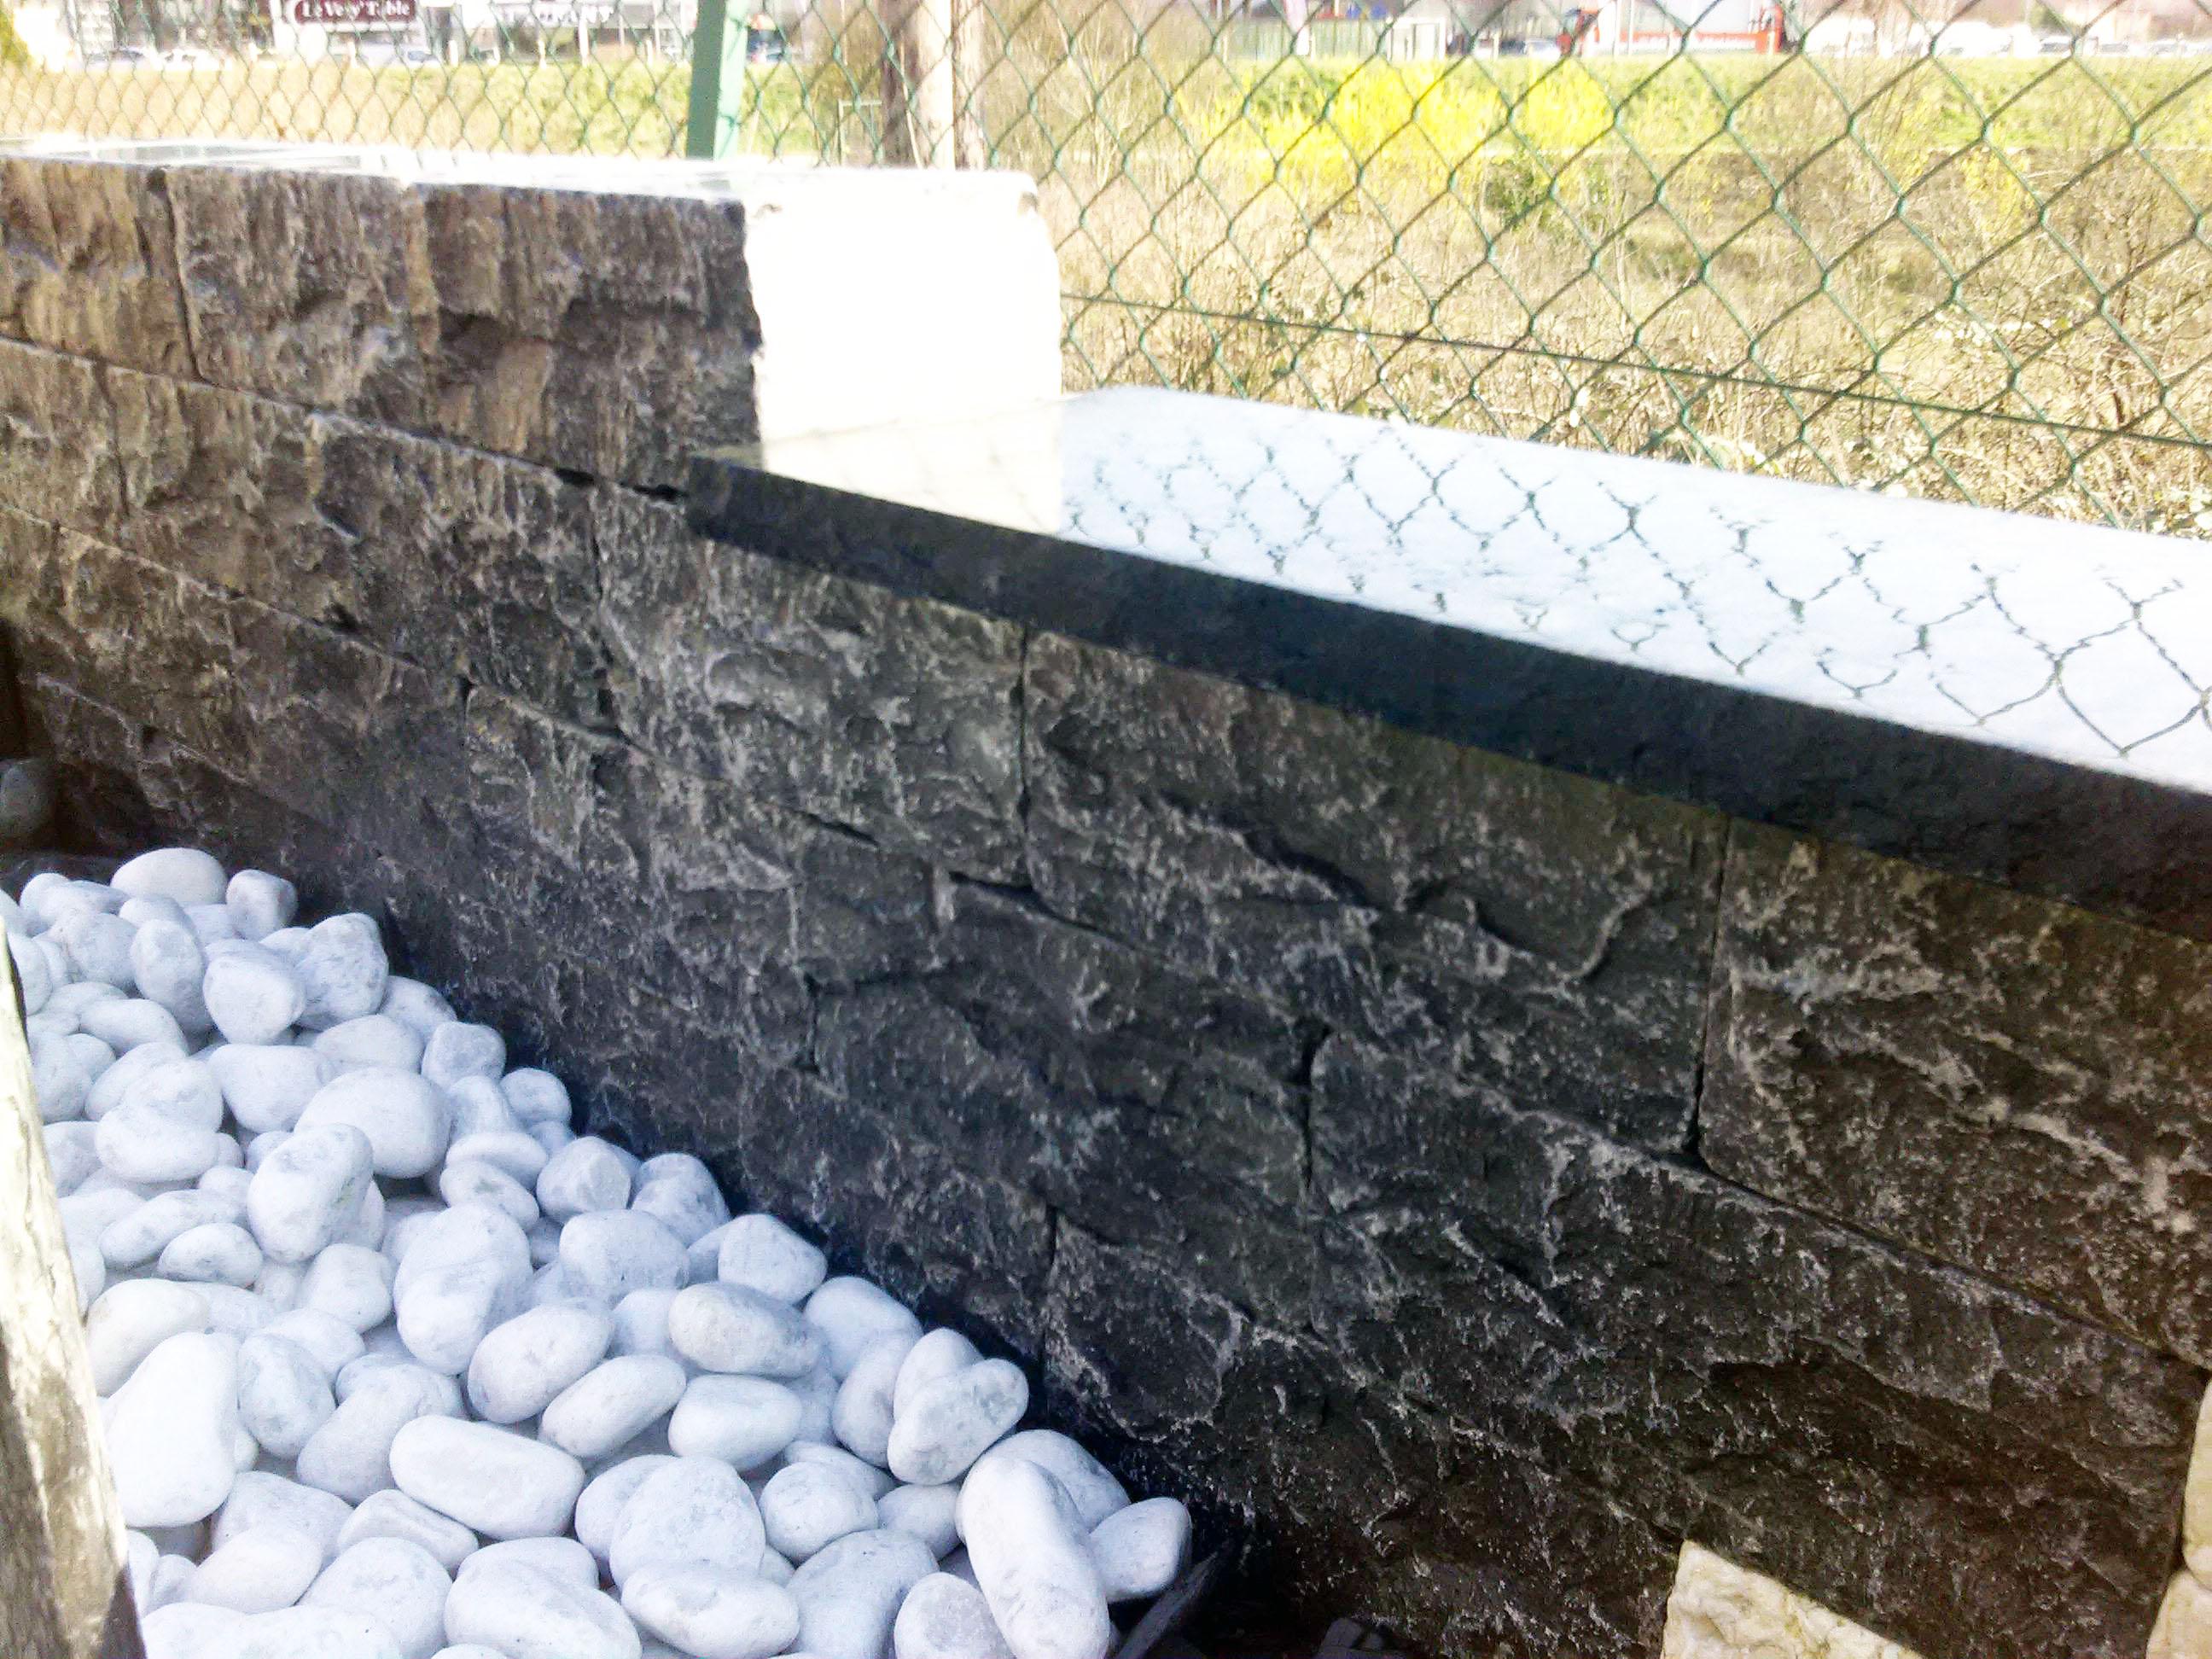 muret en pierre naturelle amnagement de jardin comment retenir la terre duun jardin en terrain. Black Bedroom Furniture Sets. Home Design Ideas